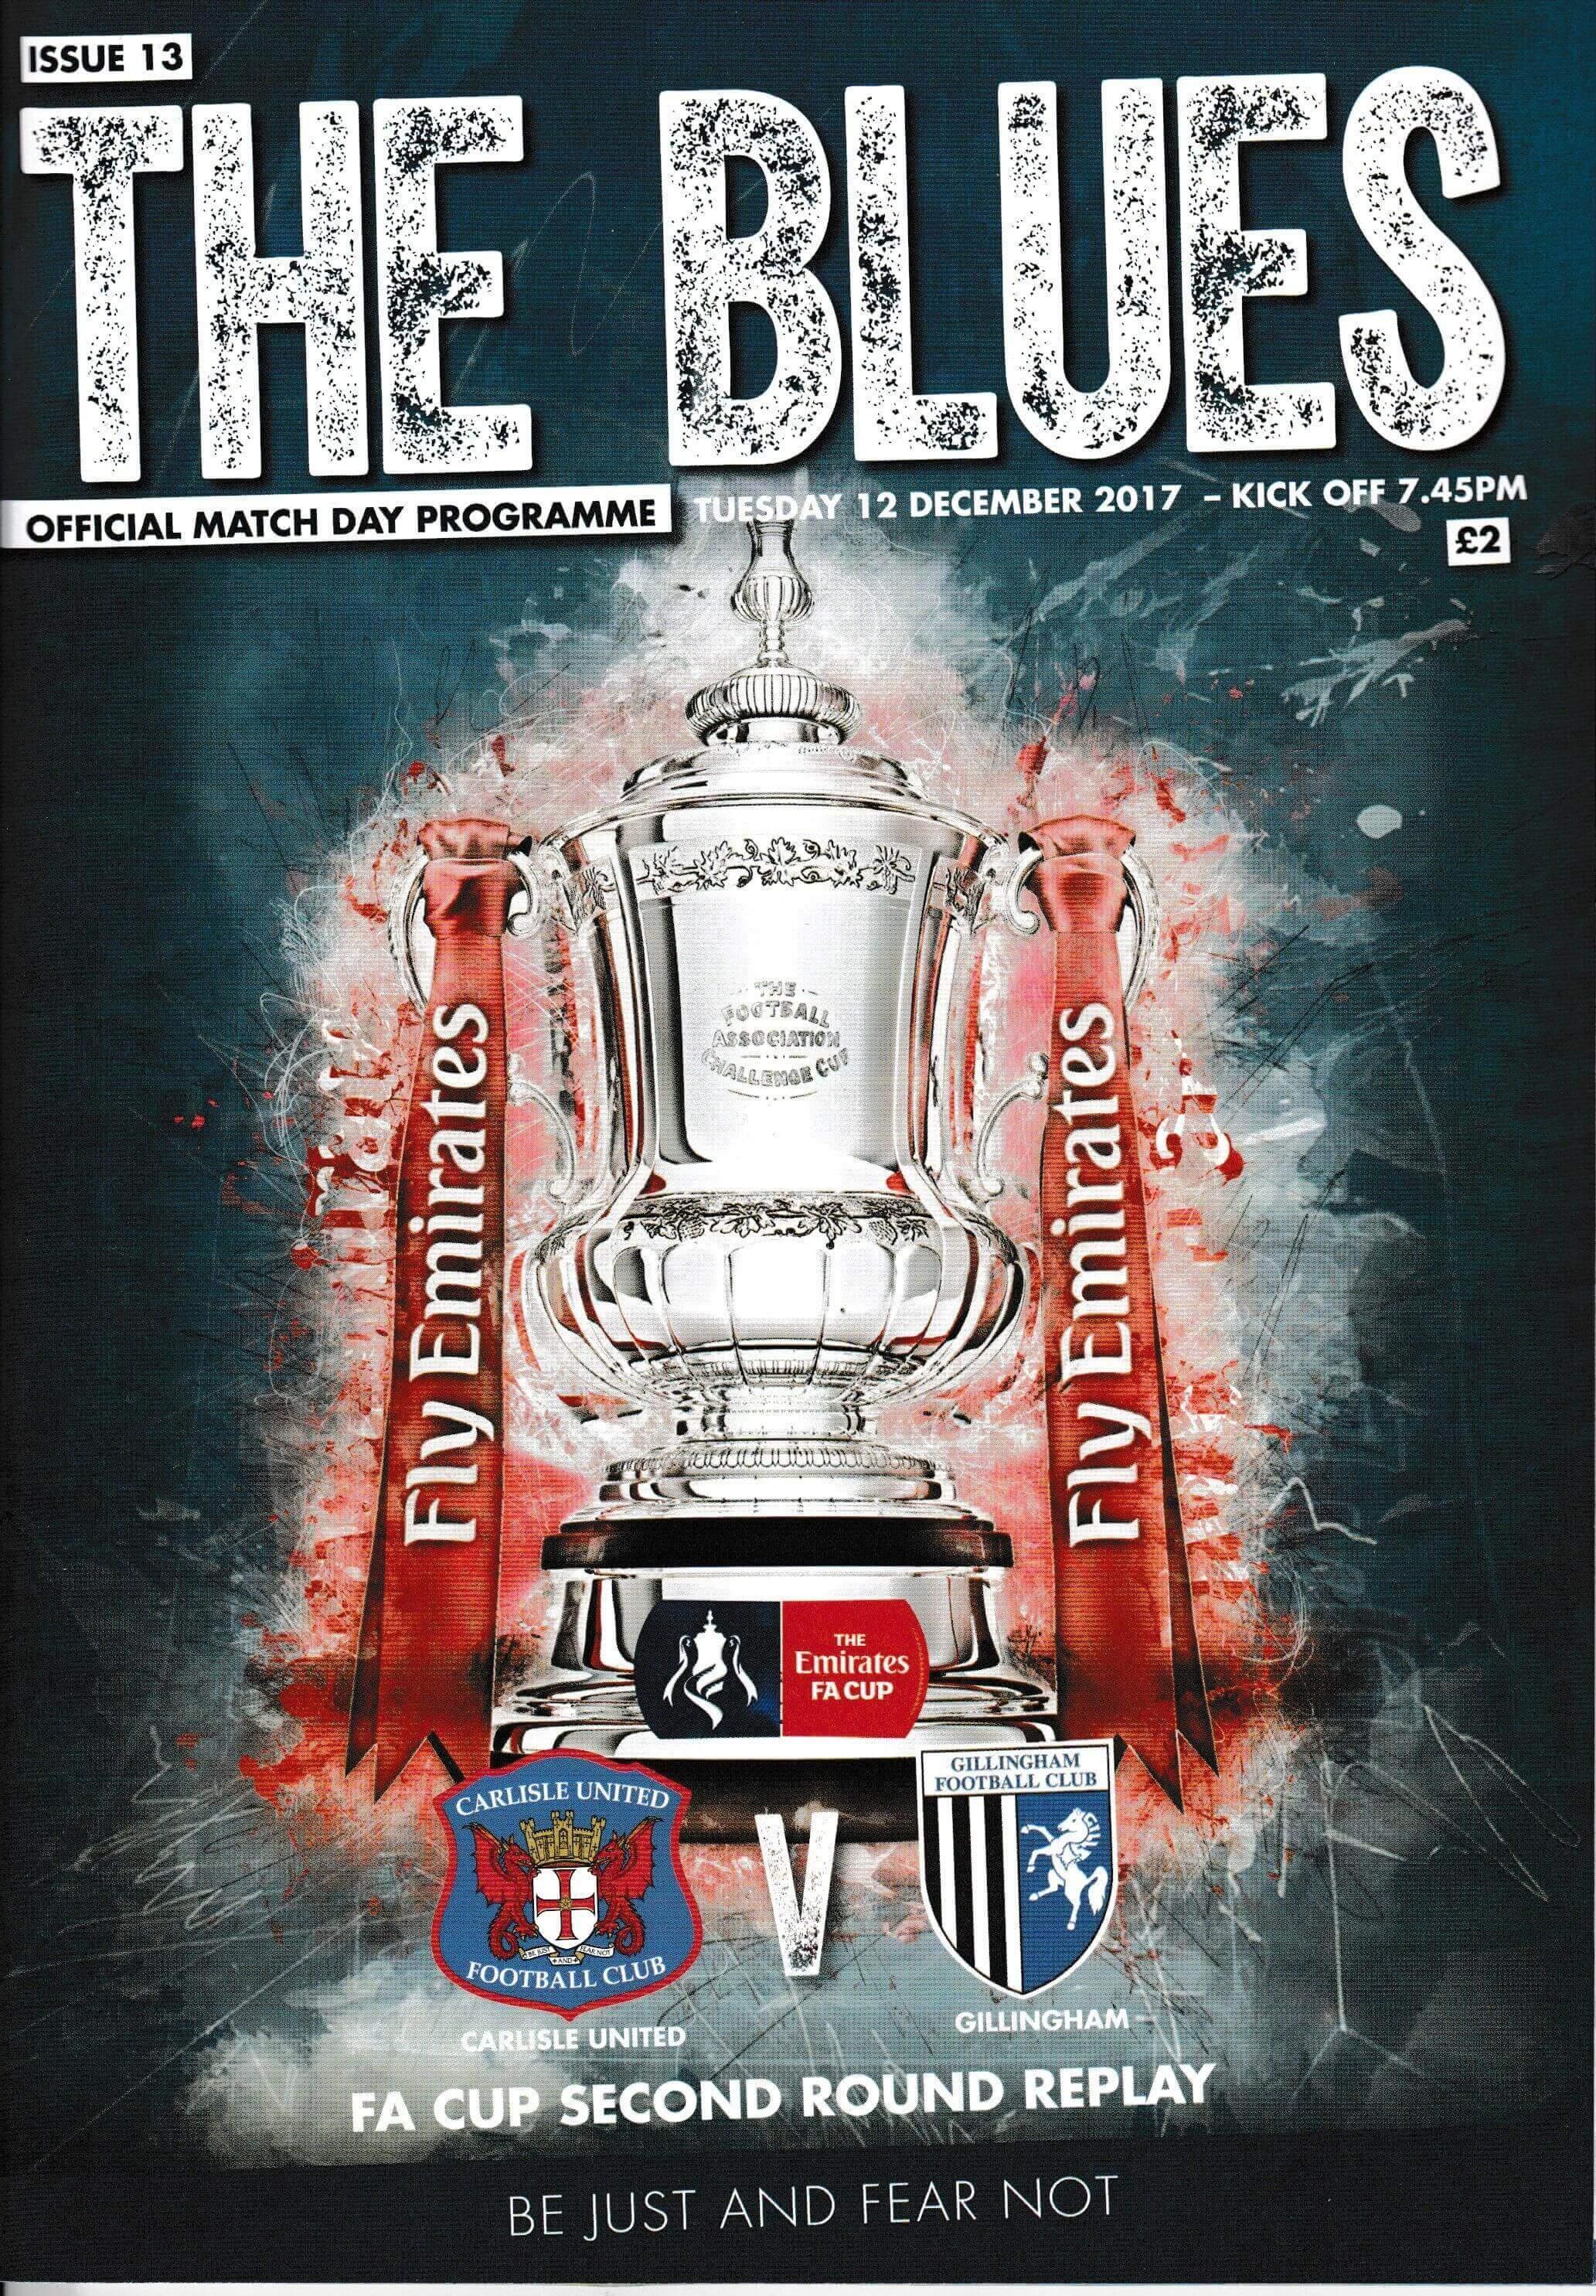 Carlisle United V Gillingham